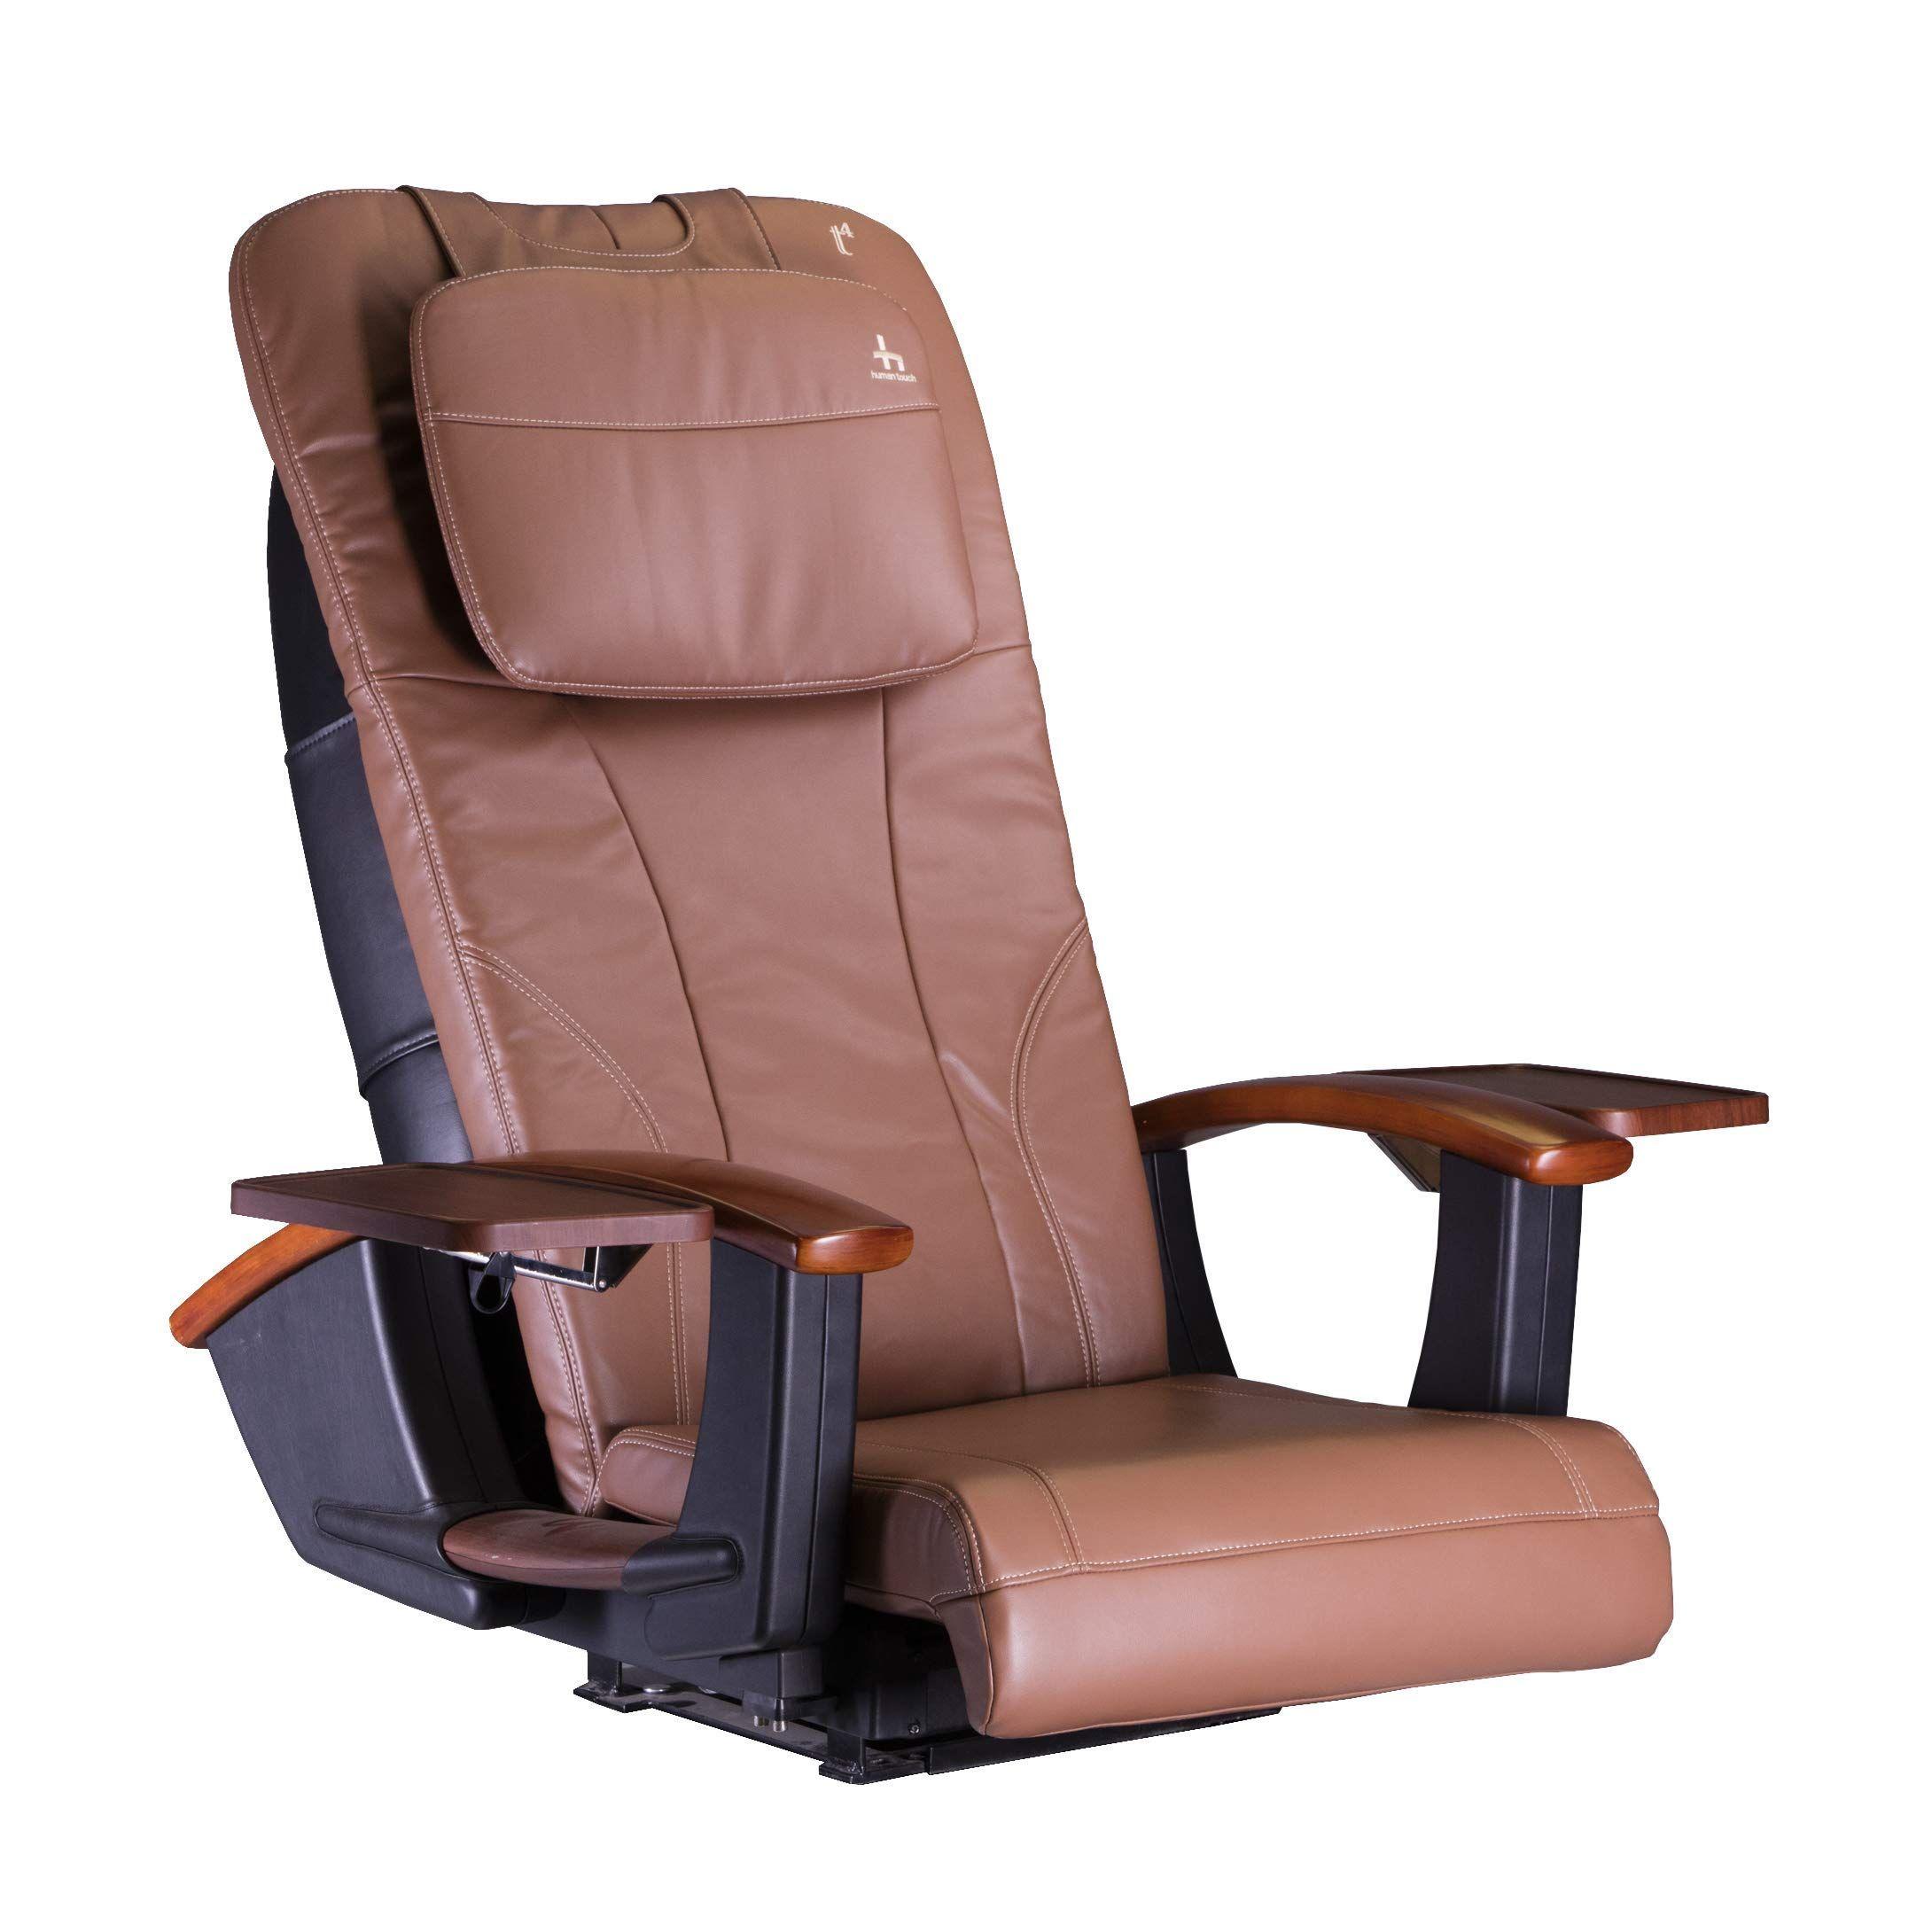 HT135 Pedicure Massage Chair Pad Set (Cappuccino